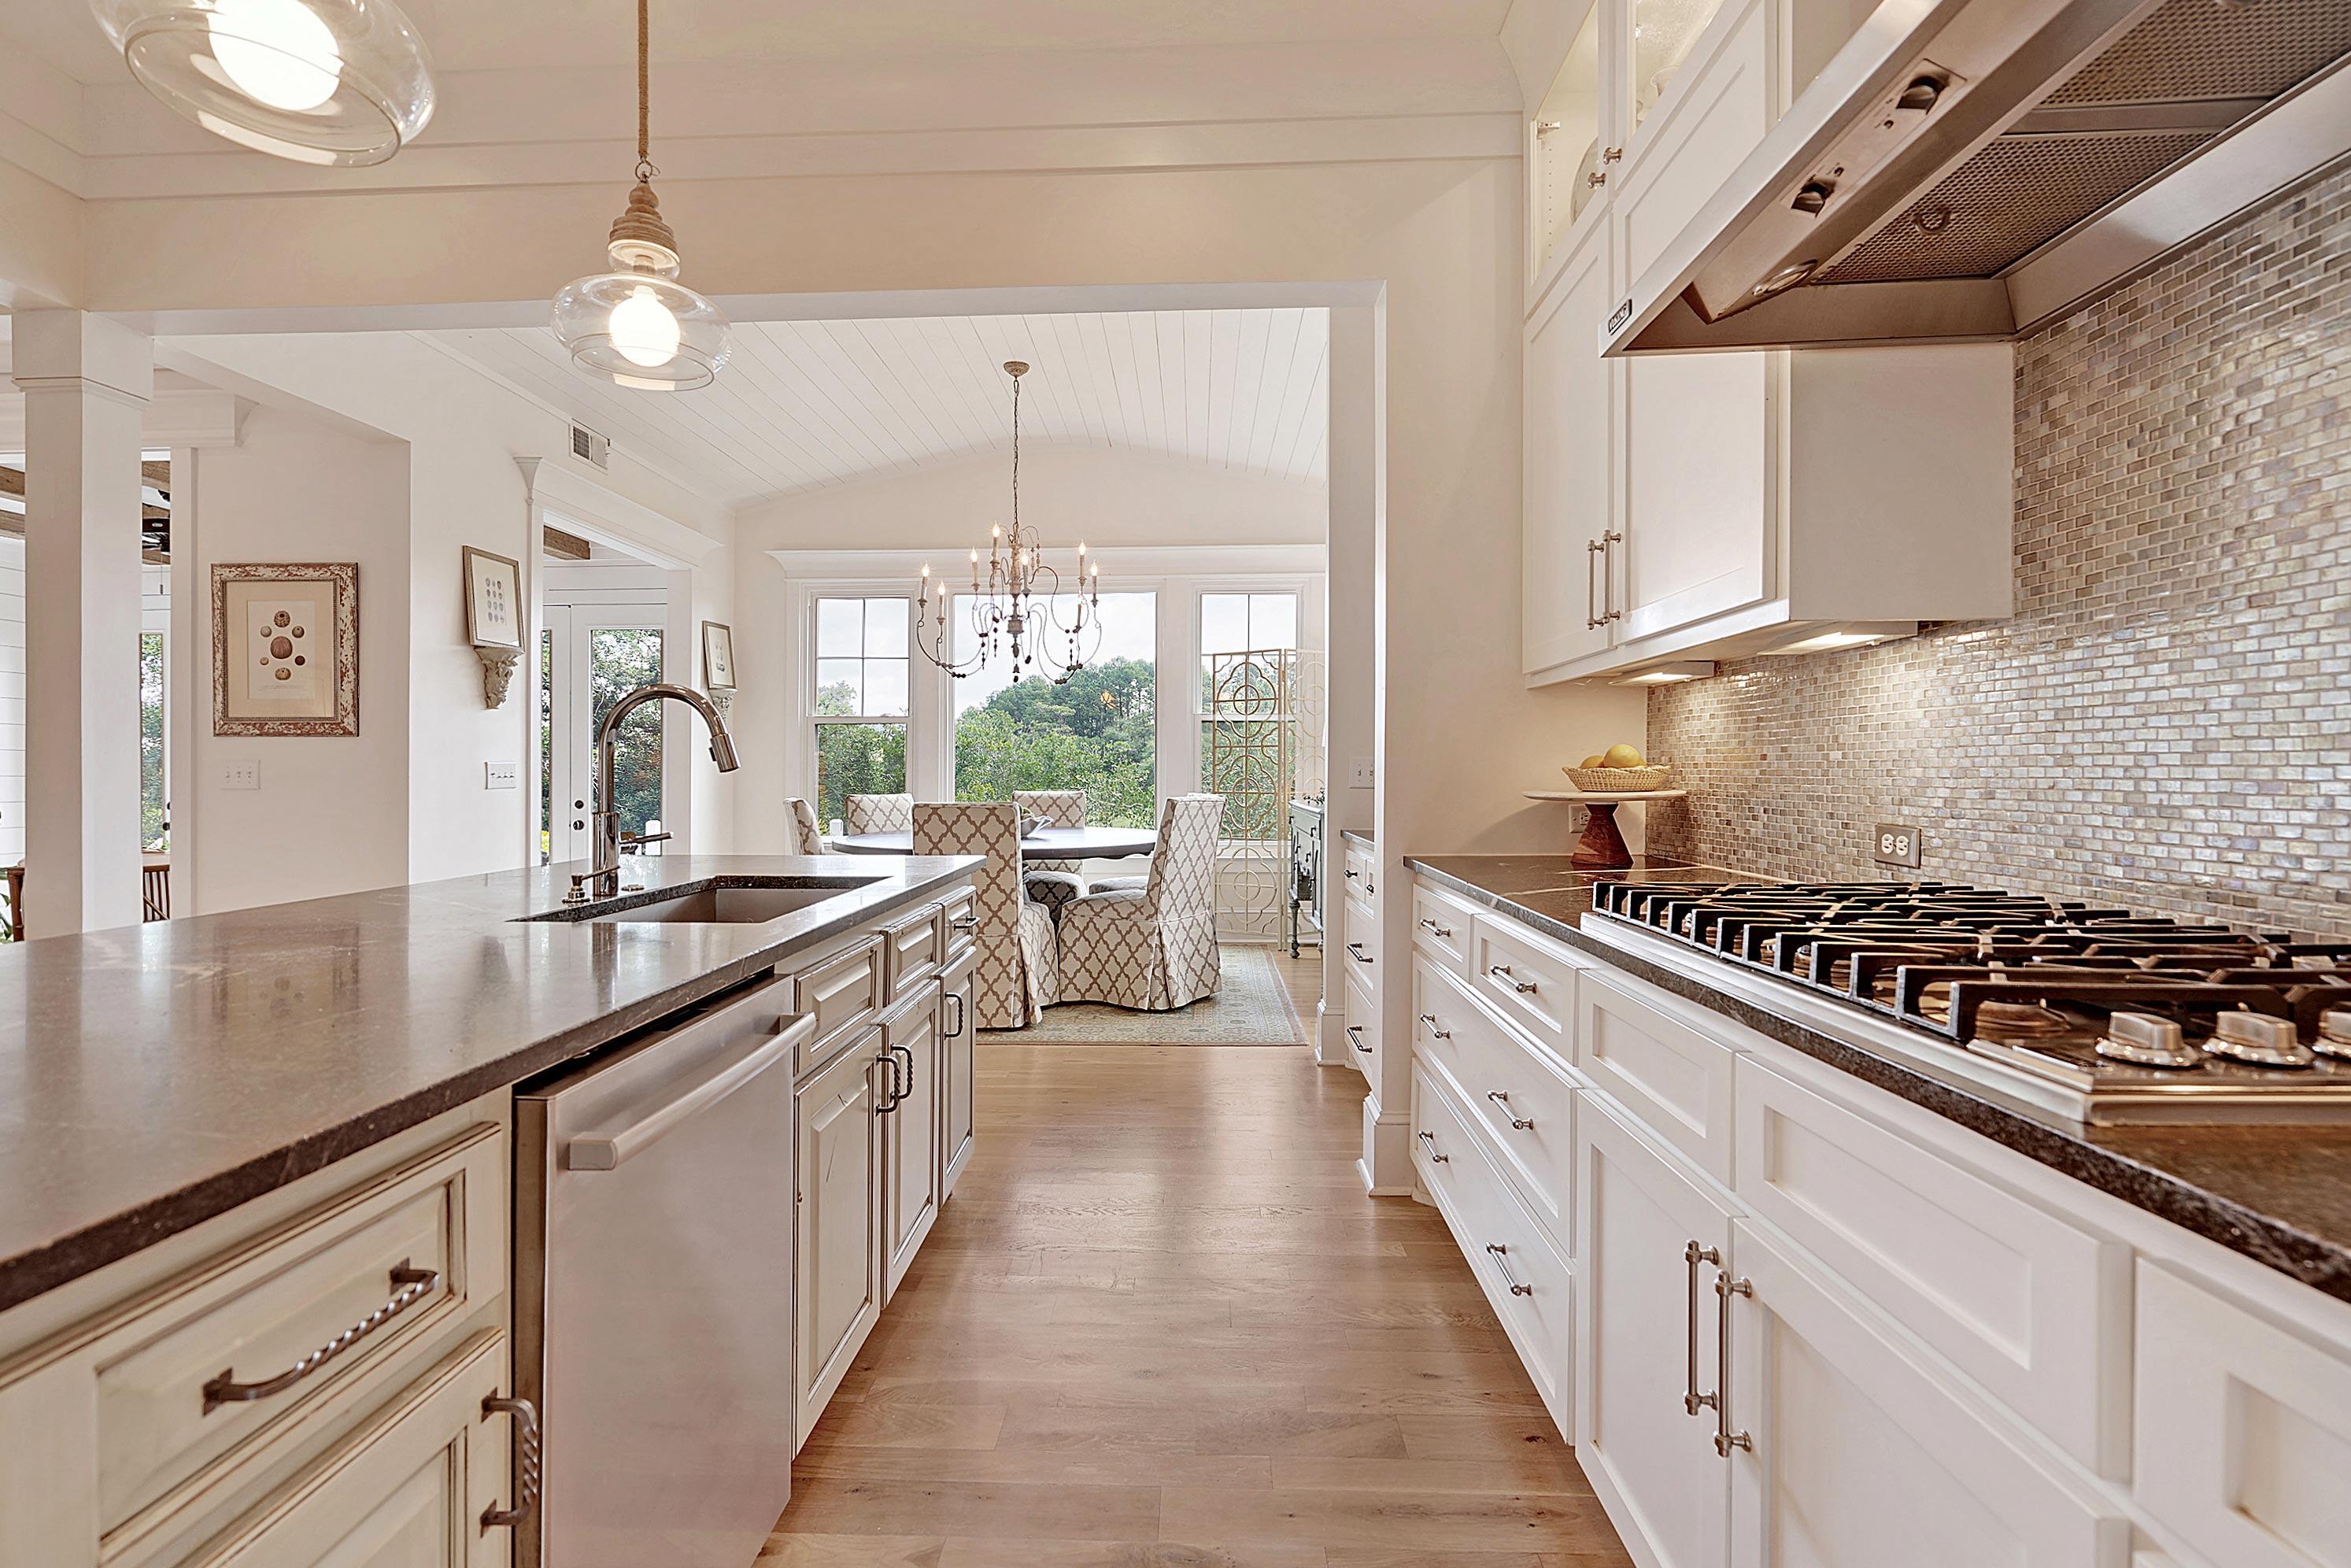 Grassy Creek Homes For Sale - 294 River Oak, Mount Pleasant, SC - 39